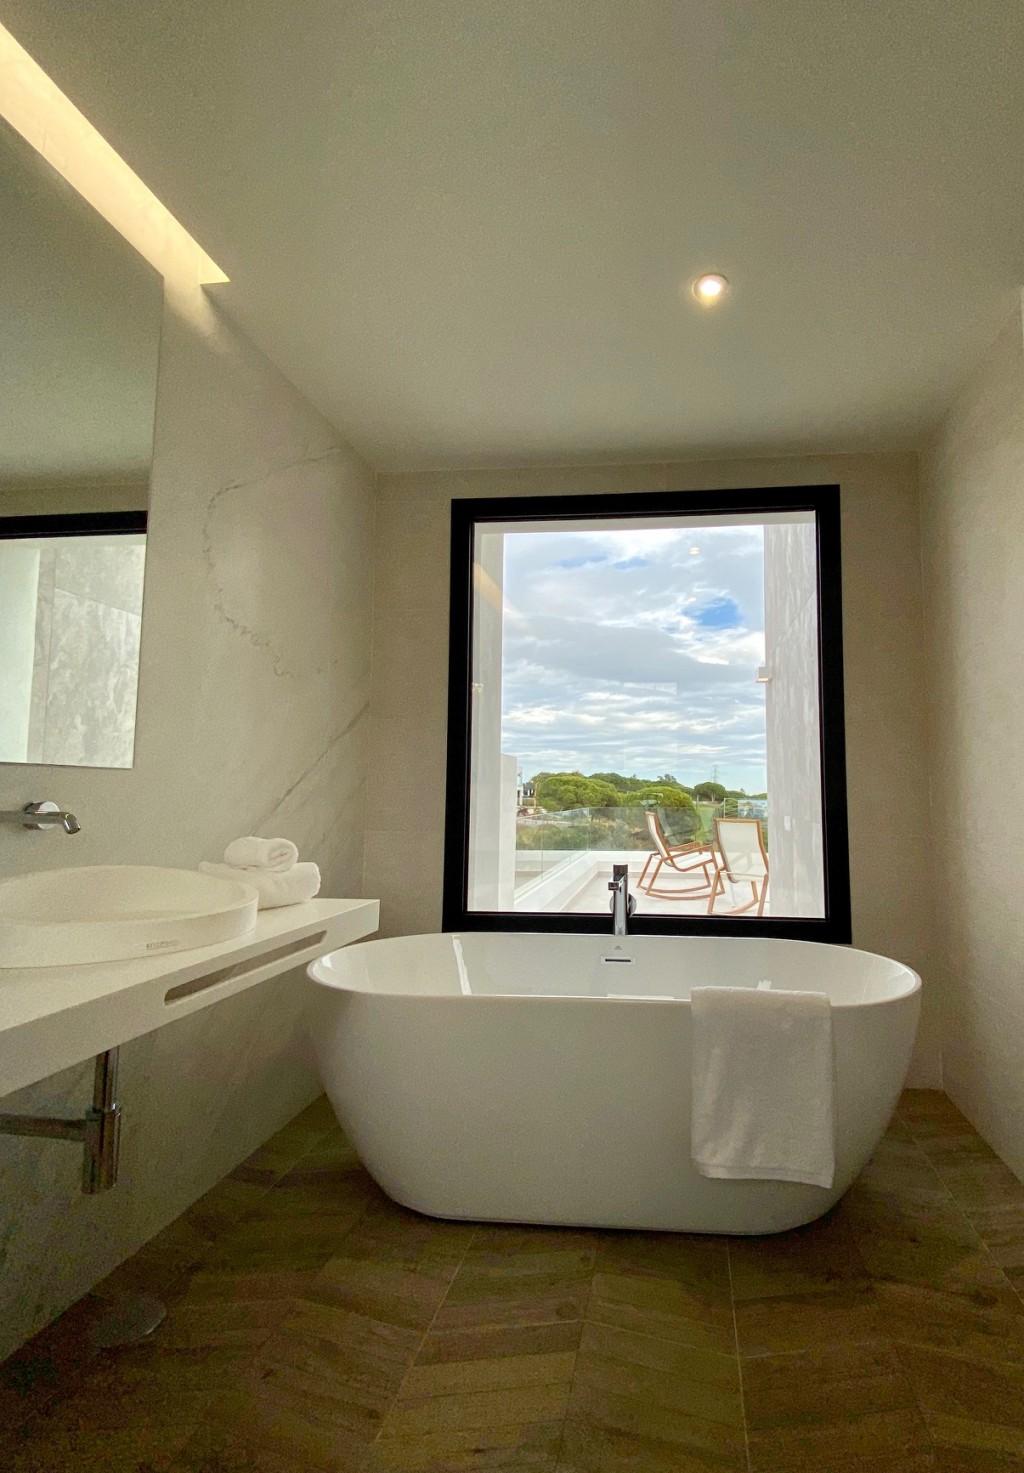 Luxusni koupelna Marbella